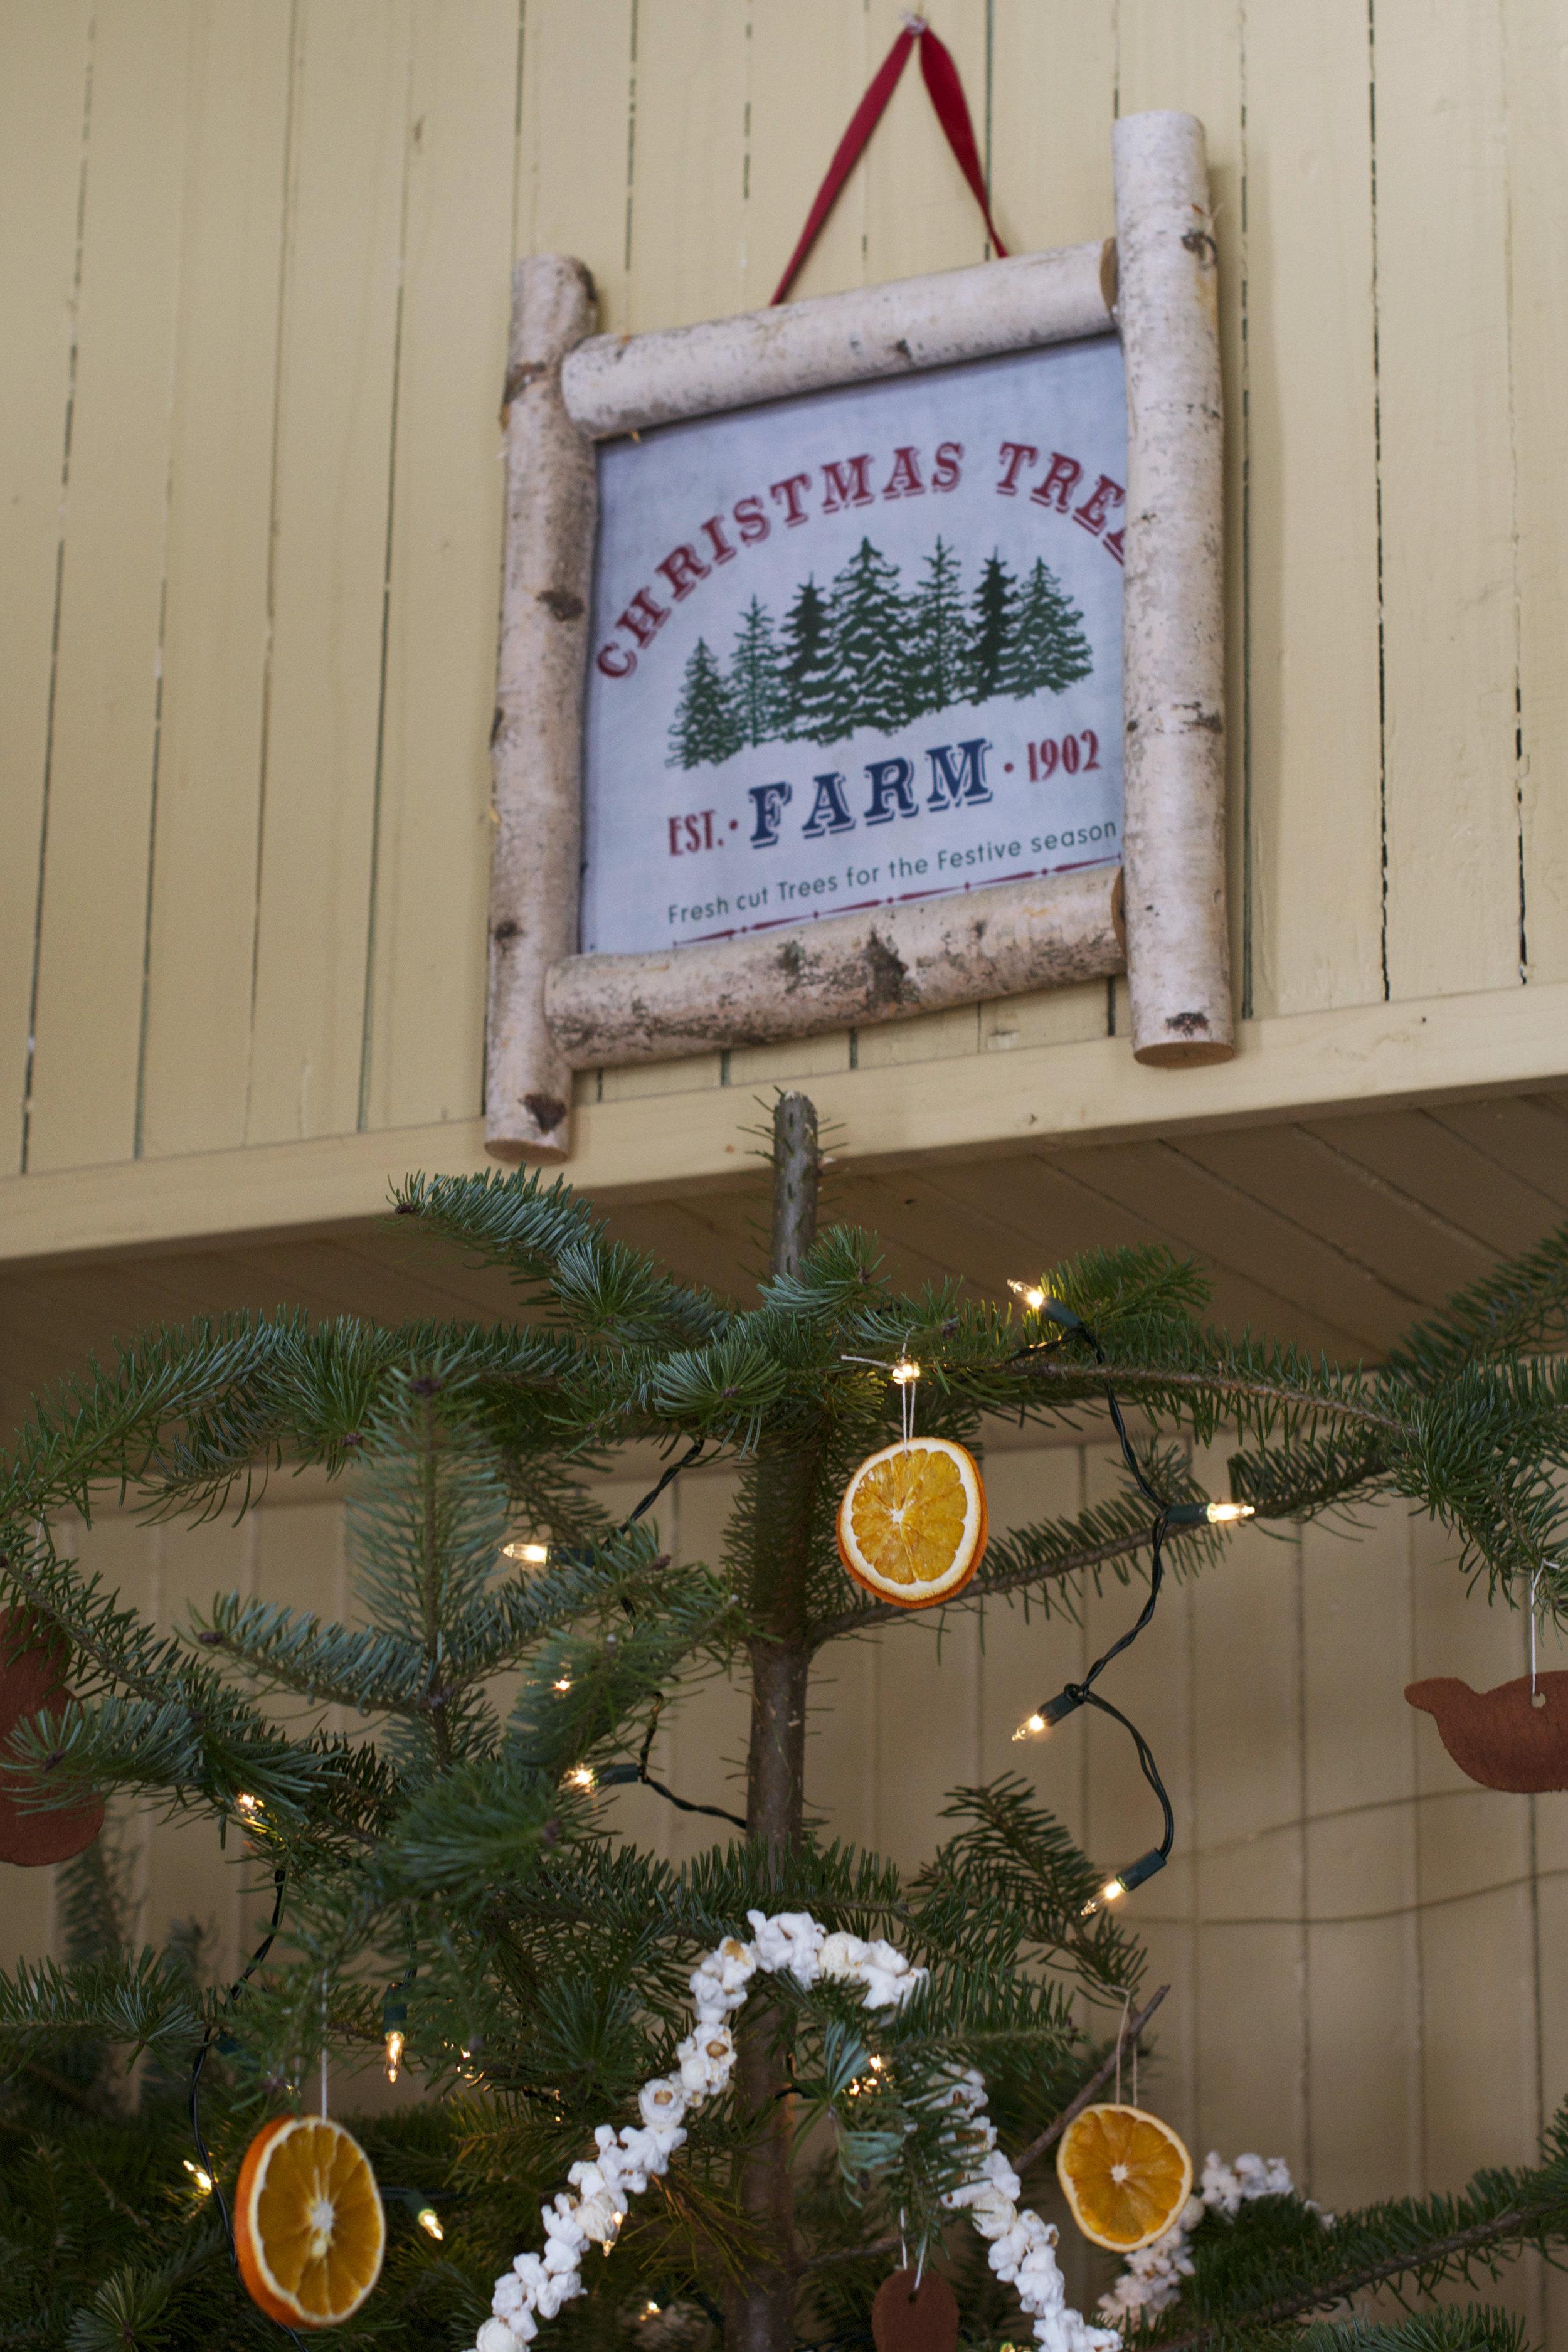 christmas-tree-farm-sign-and-tree.jpg